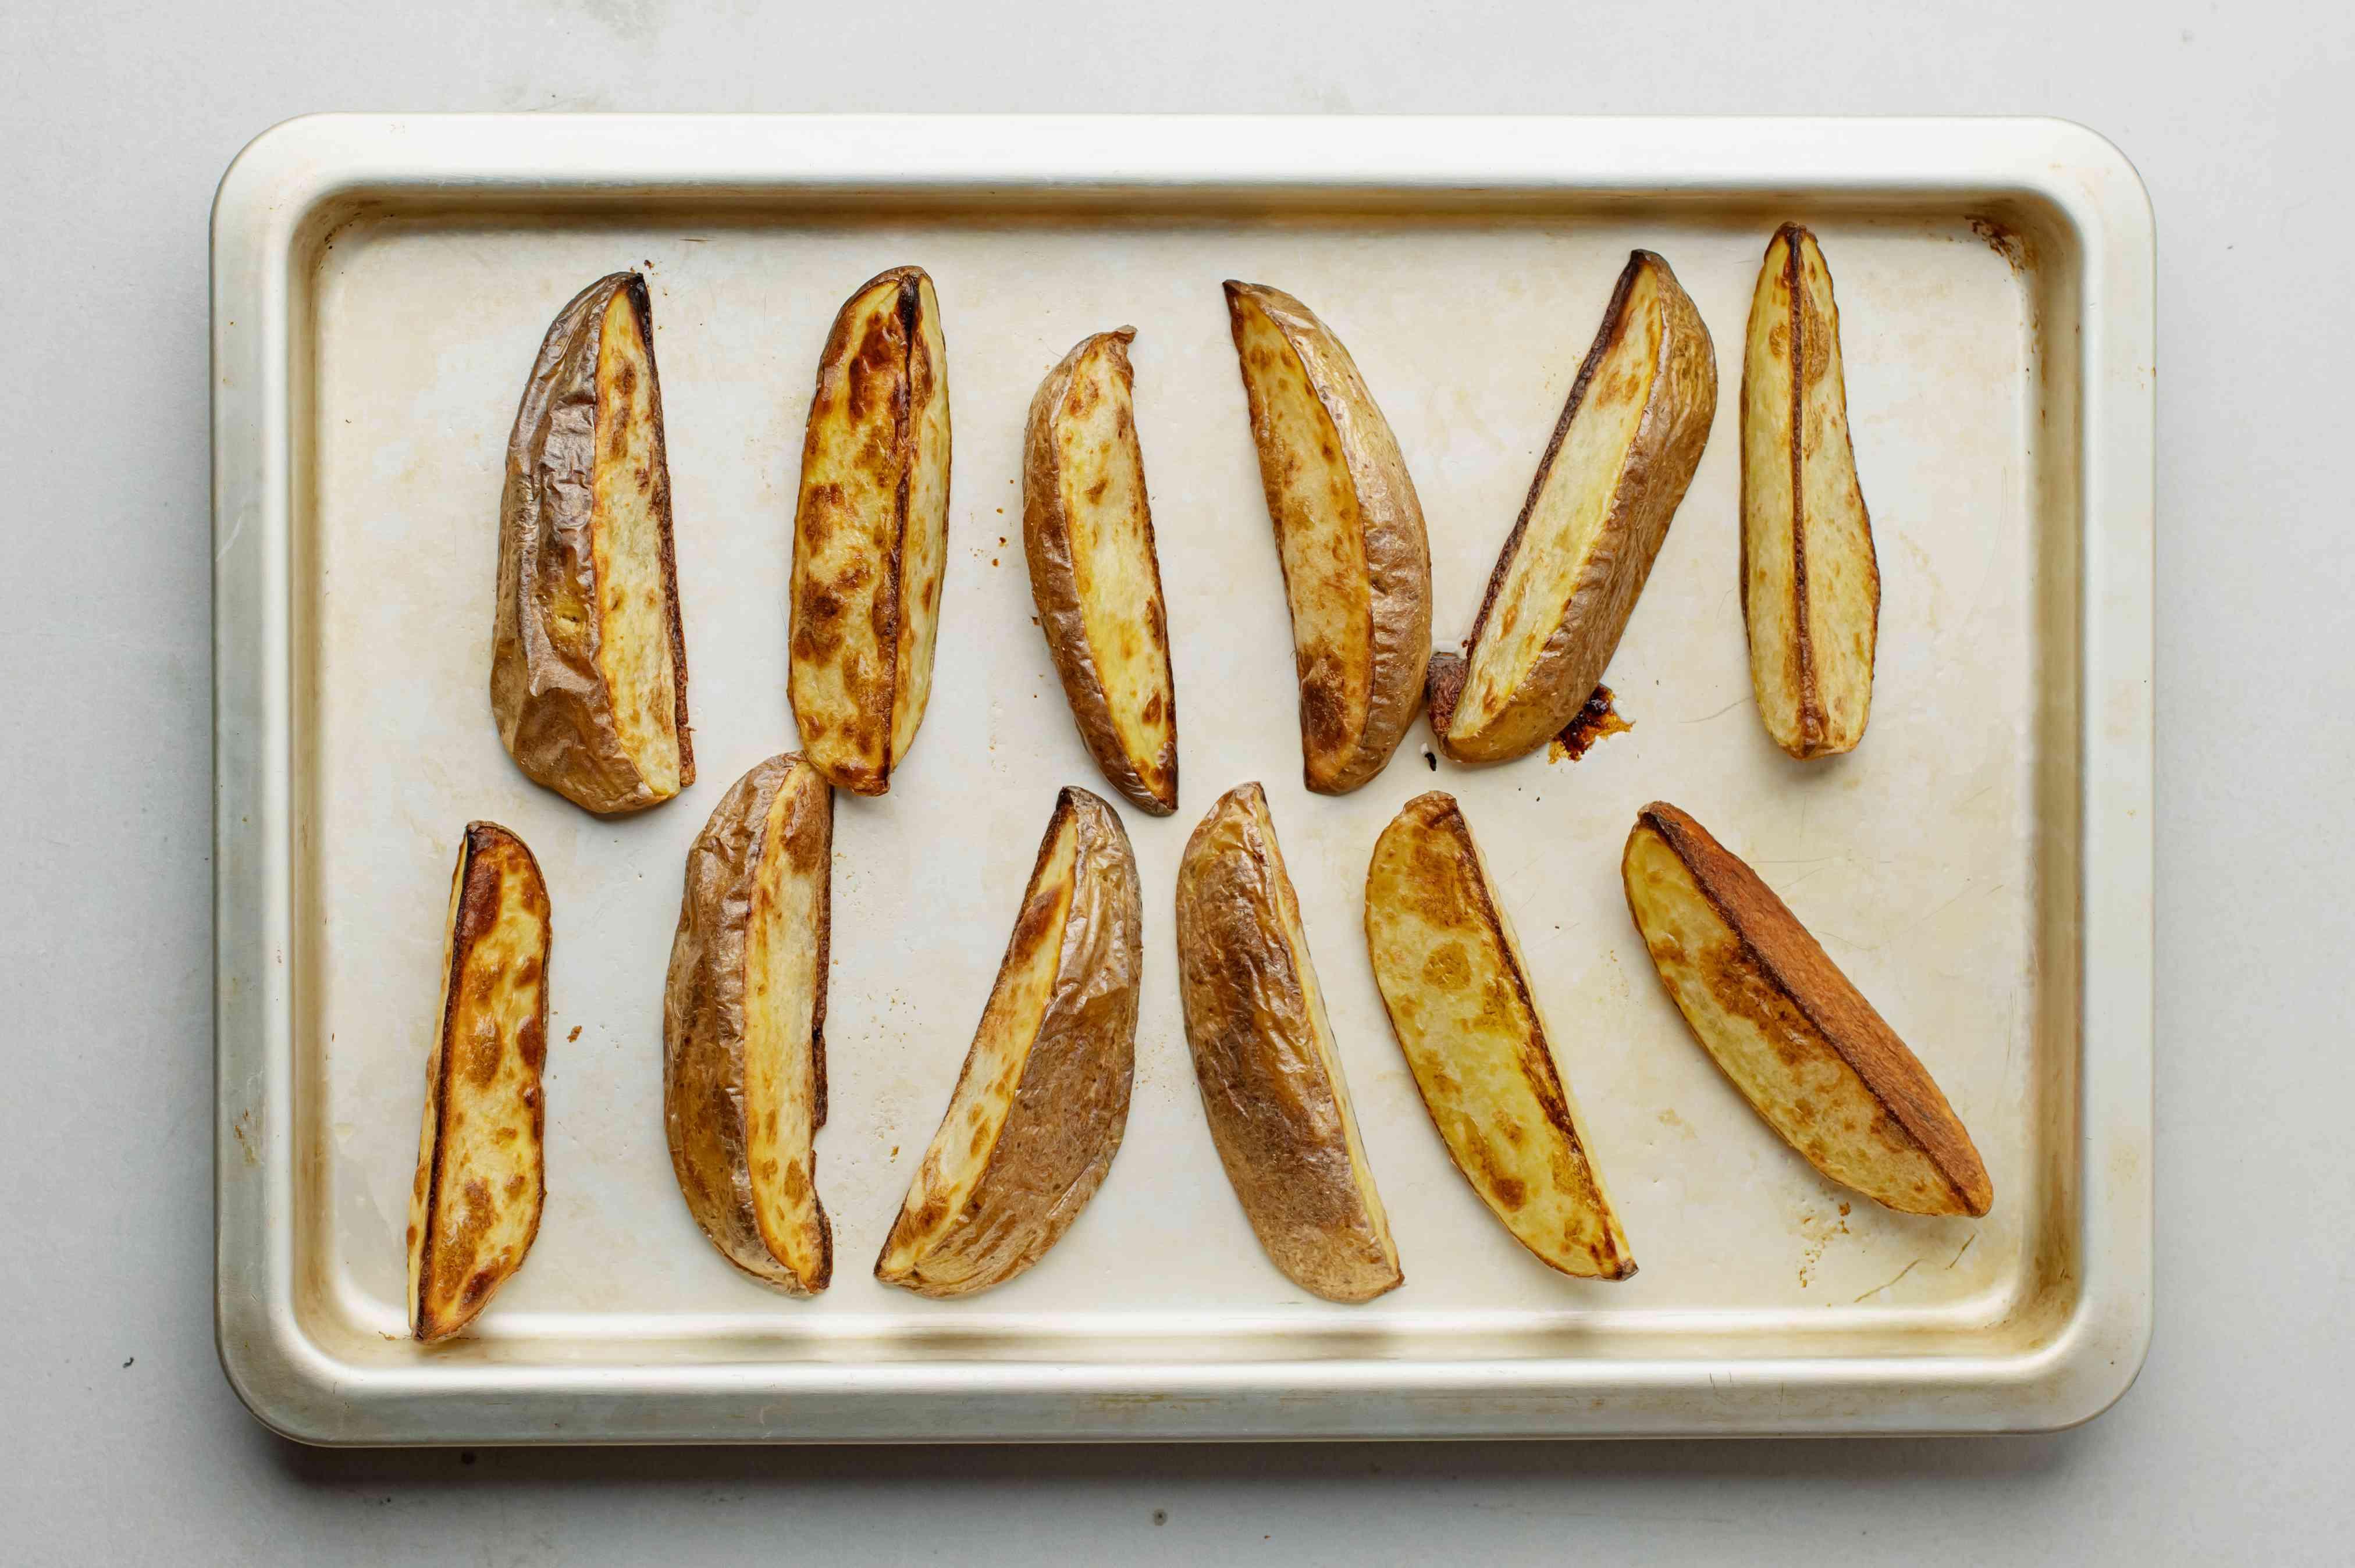 Bake potato wedges